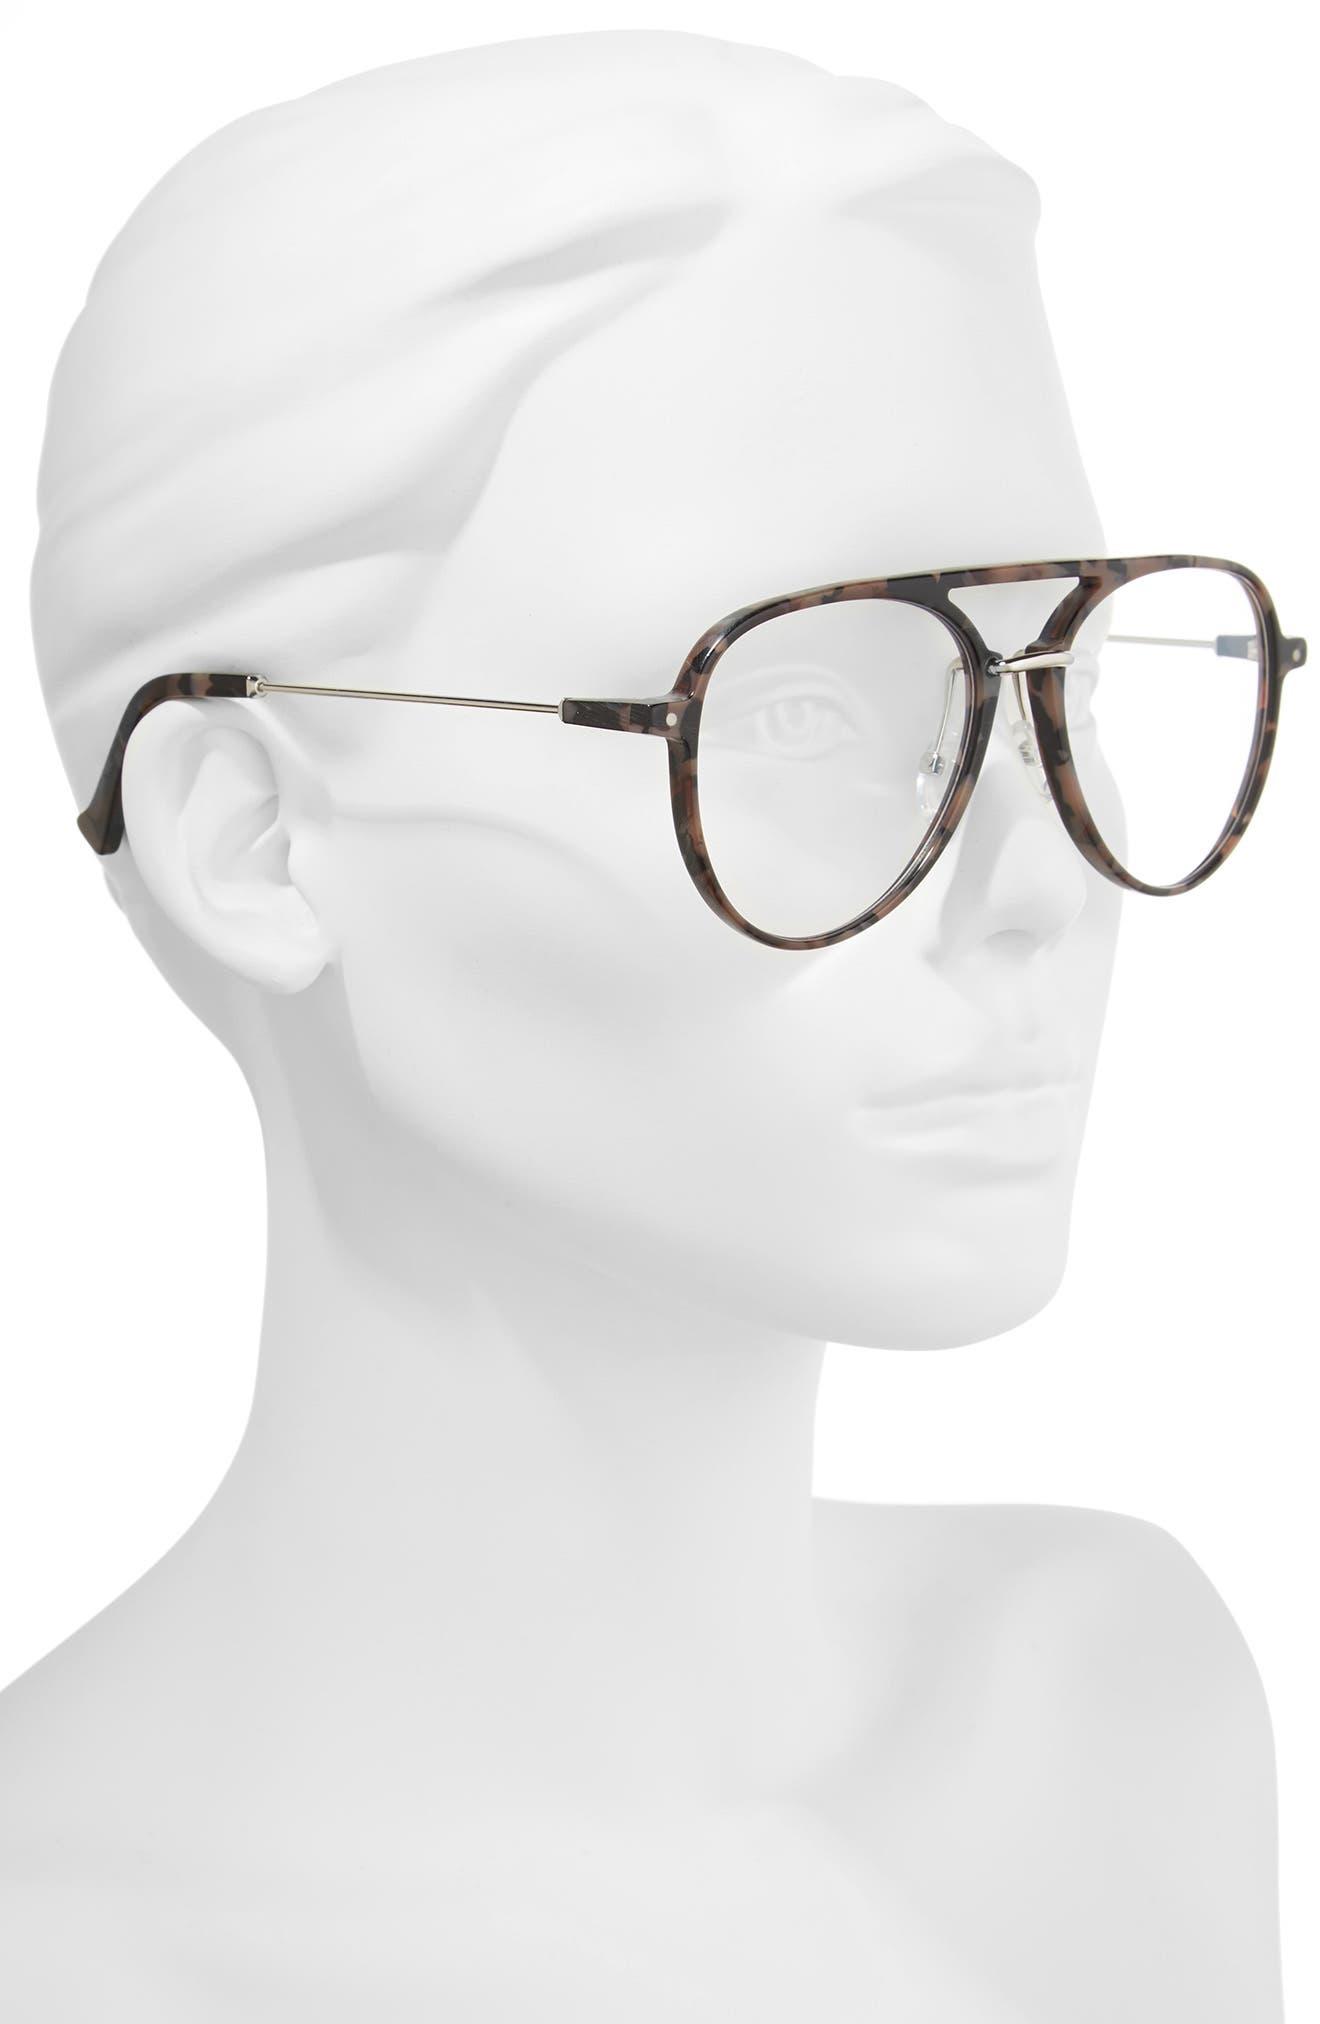 Praph 57mm Optical Glasses,                             Alternate thumbnail 2, color,                             Rose Tortoise/ Optical